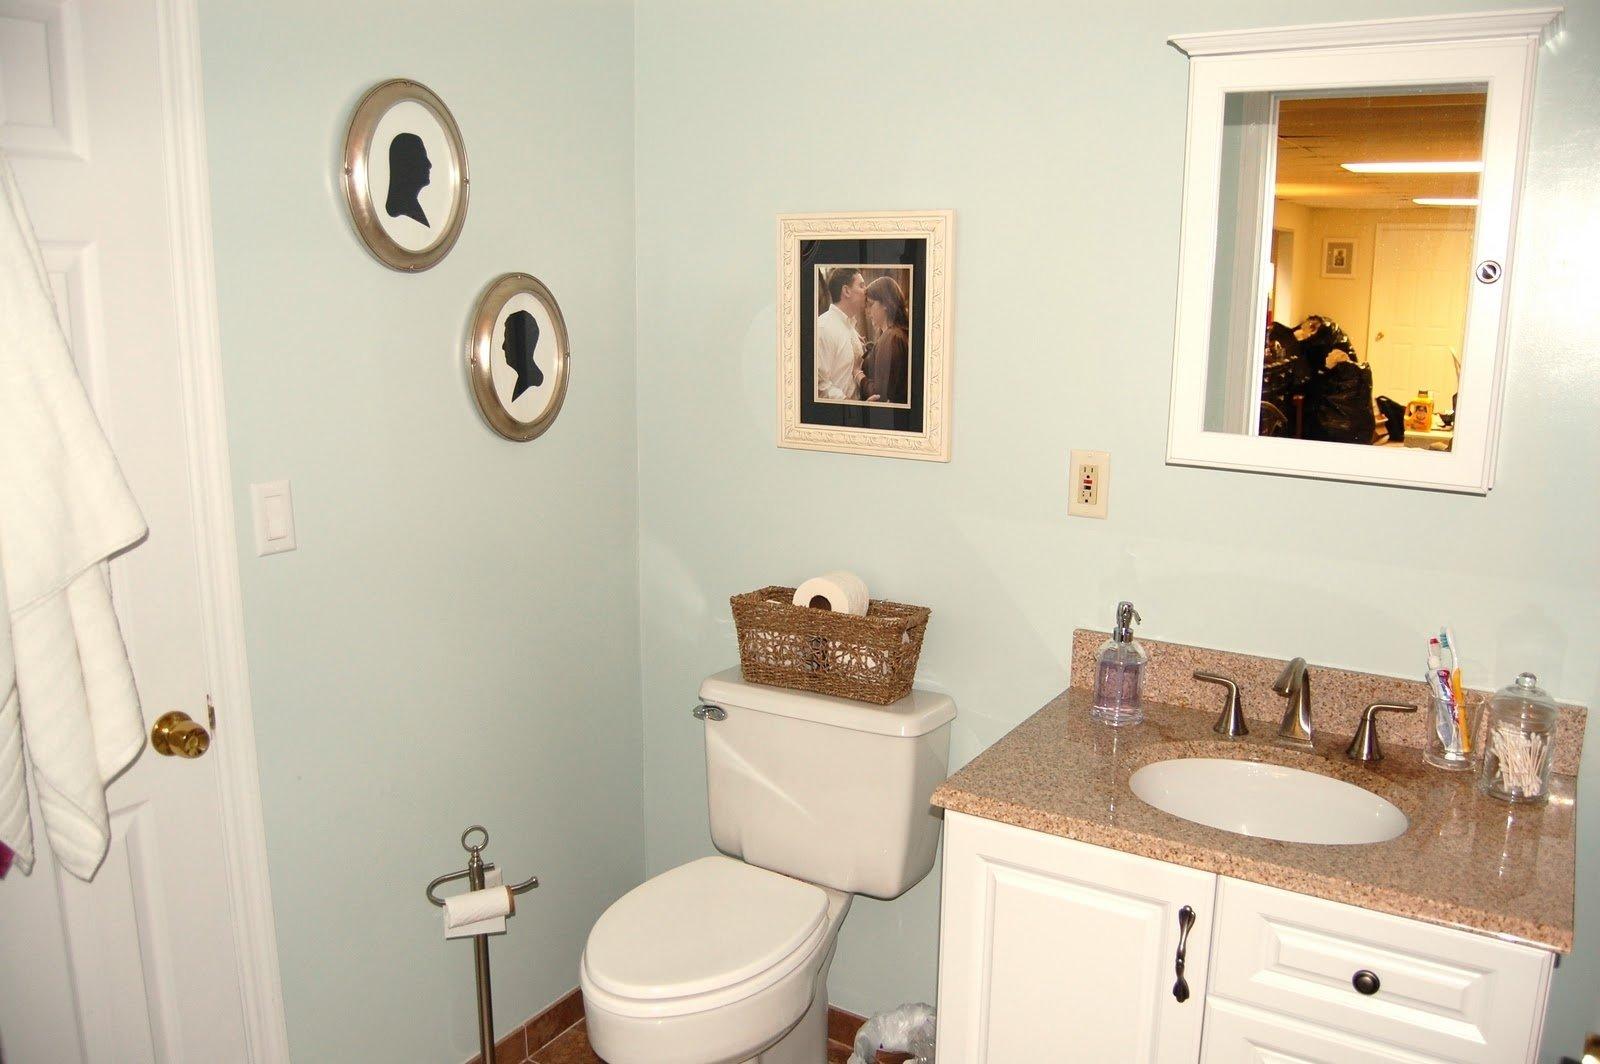 round white ceramic vessel single sink small apartment bathroom